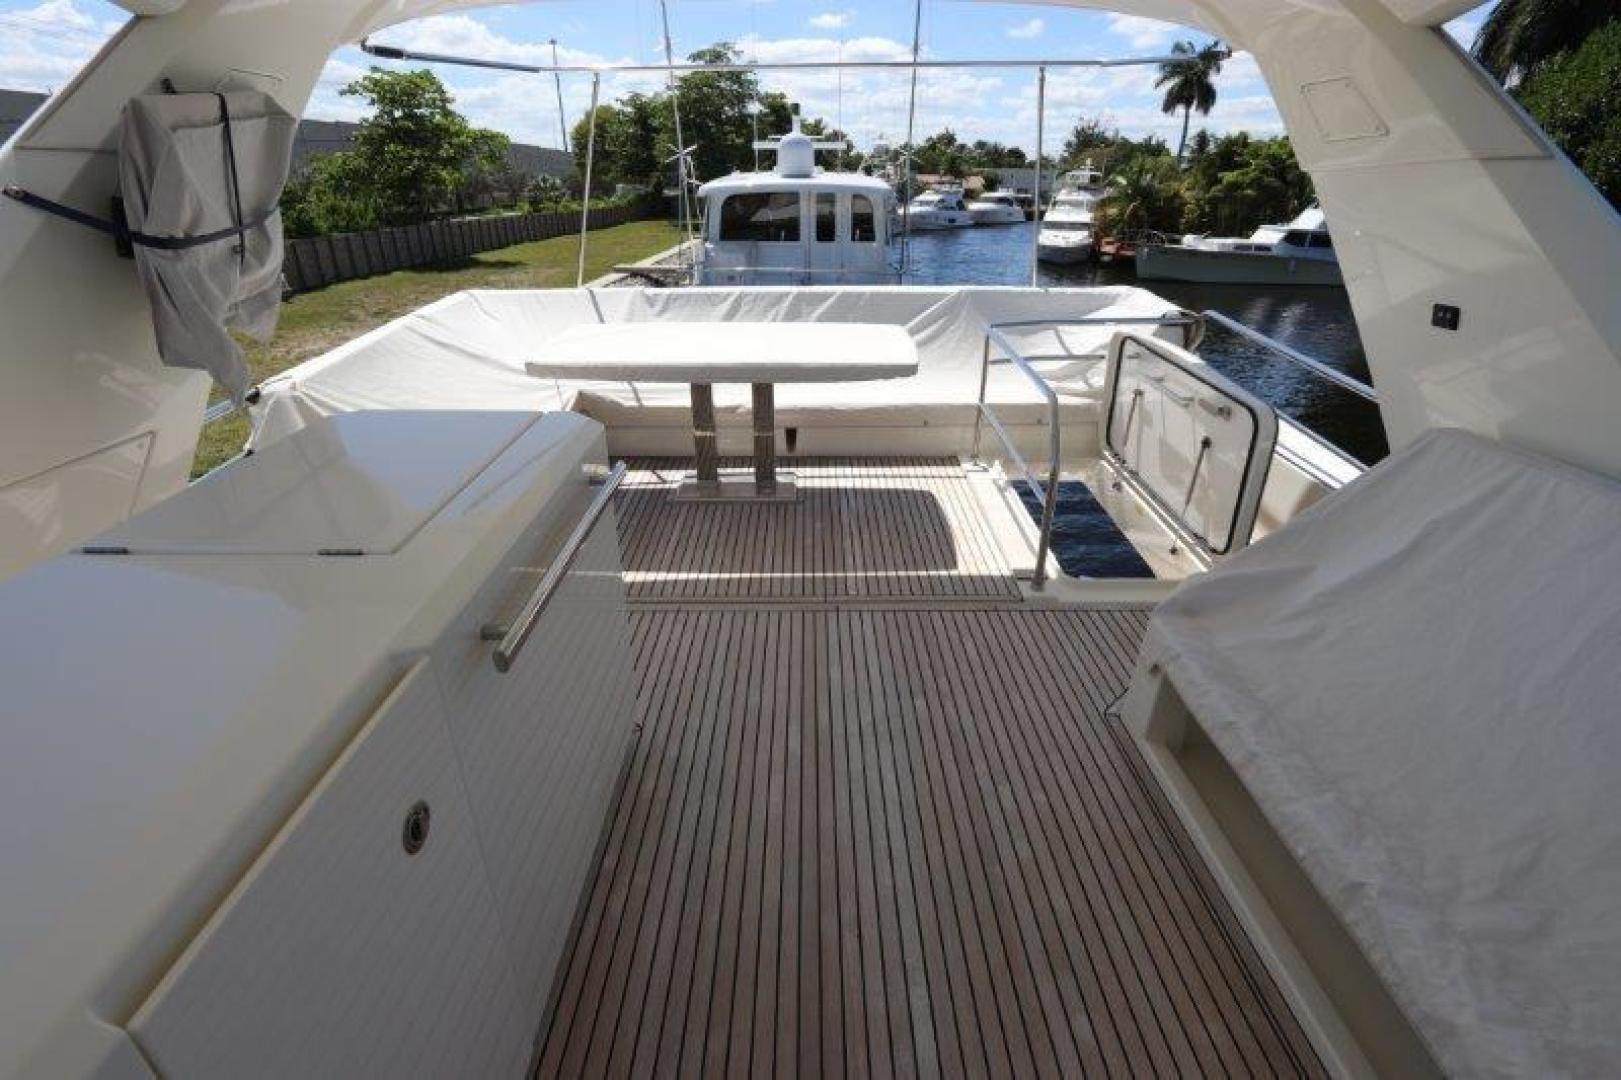 Prestige-Motoryacht 2017-Breathe Easy Fort Lauderdale-Florida-United States-1303870   Thumbnail